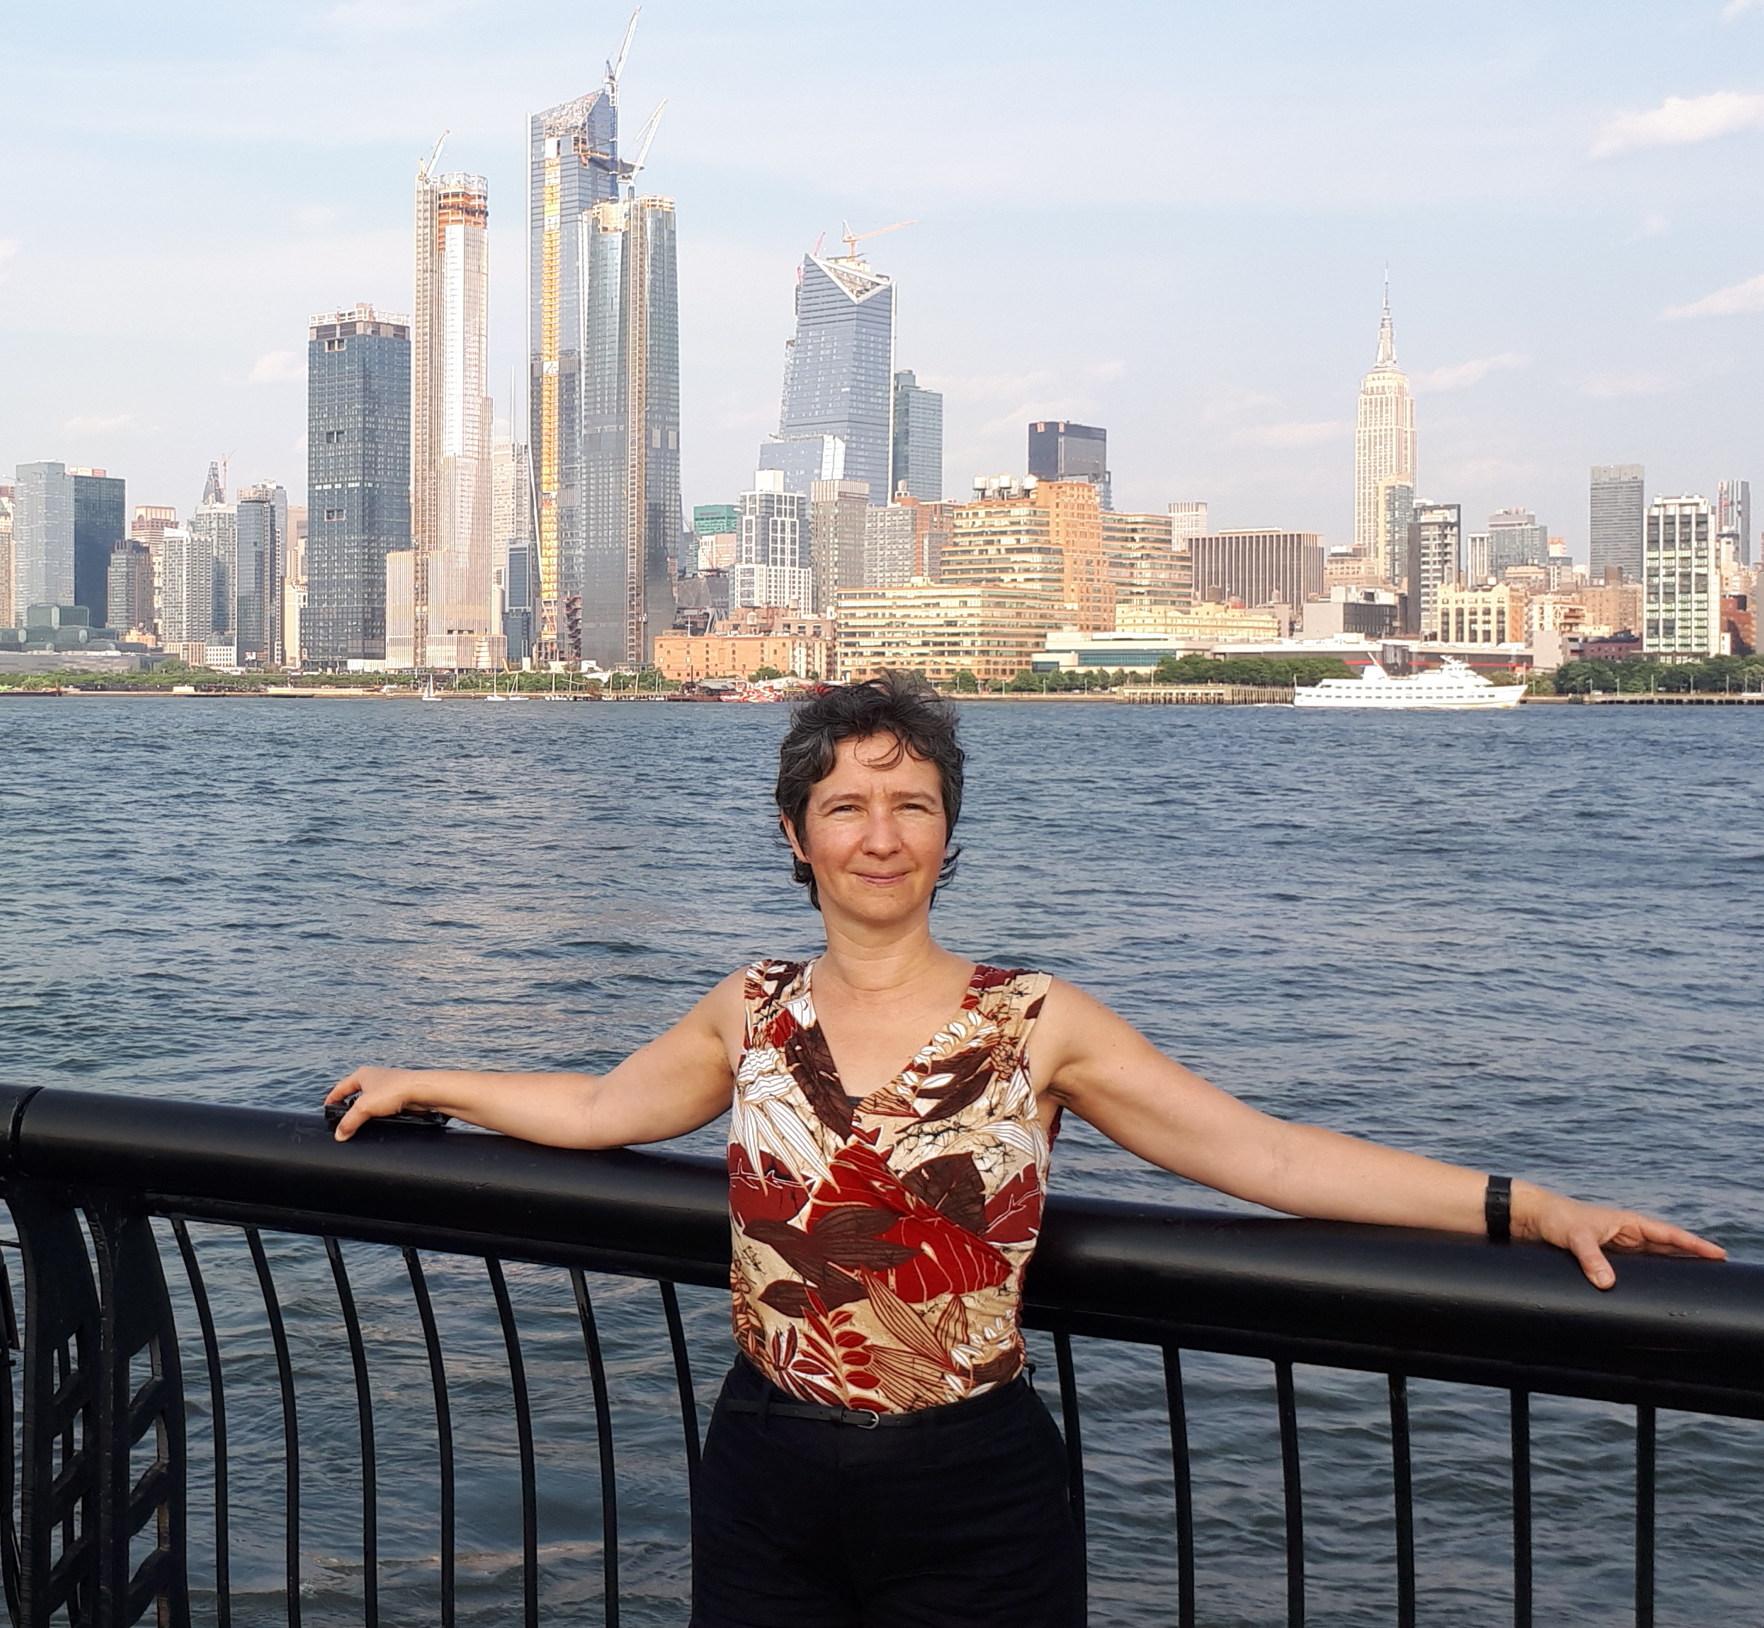 Марина Вилкова, лицензированный специалист по холистической медицине, нутрициолог (MarinaVilkoff, Registered Holistic Nutritionist),